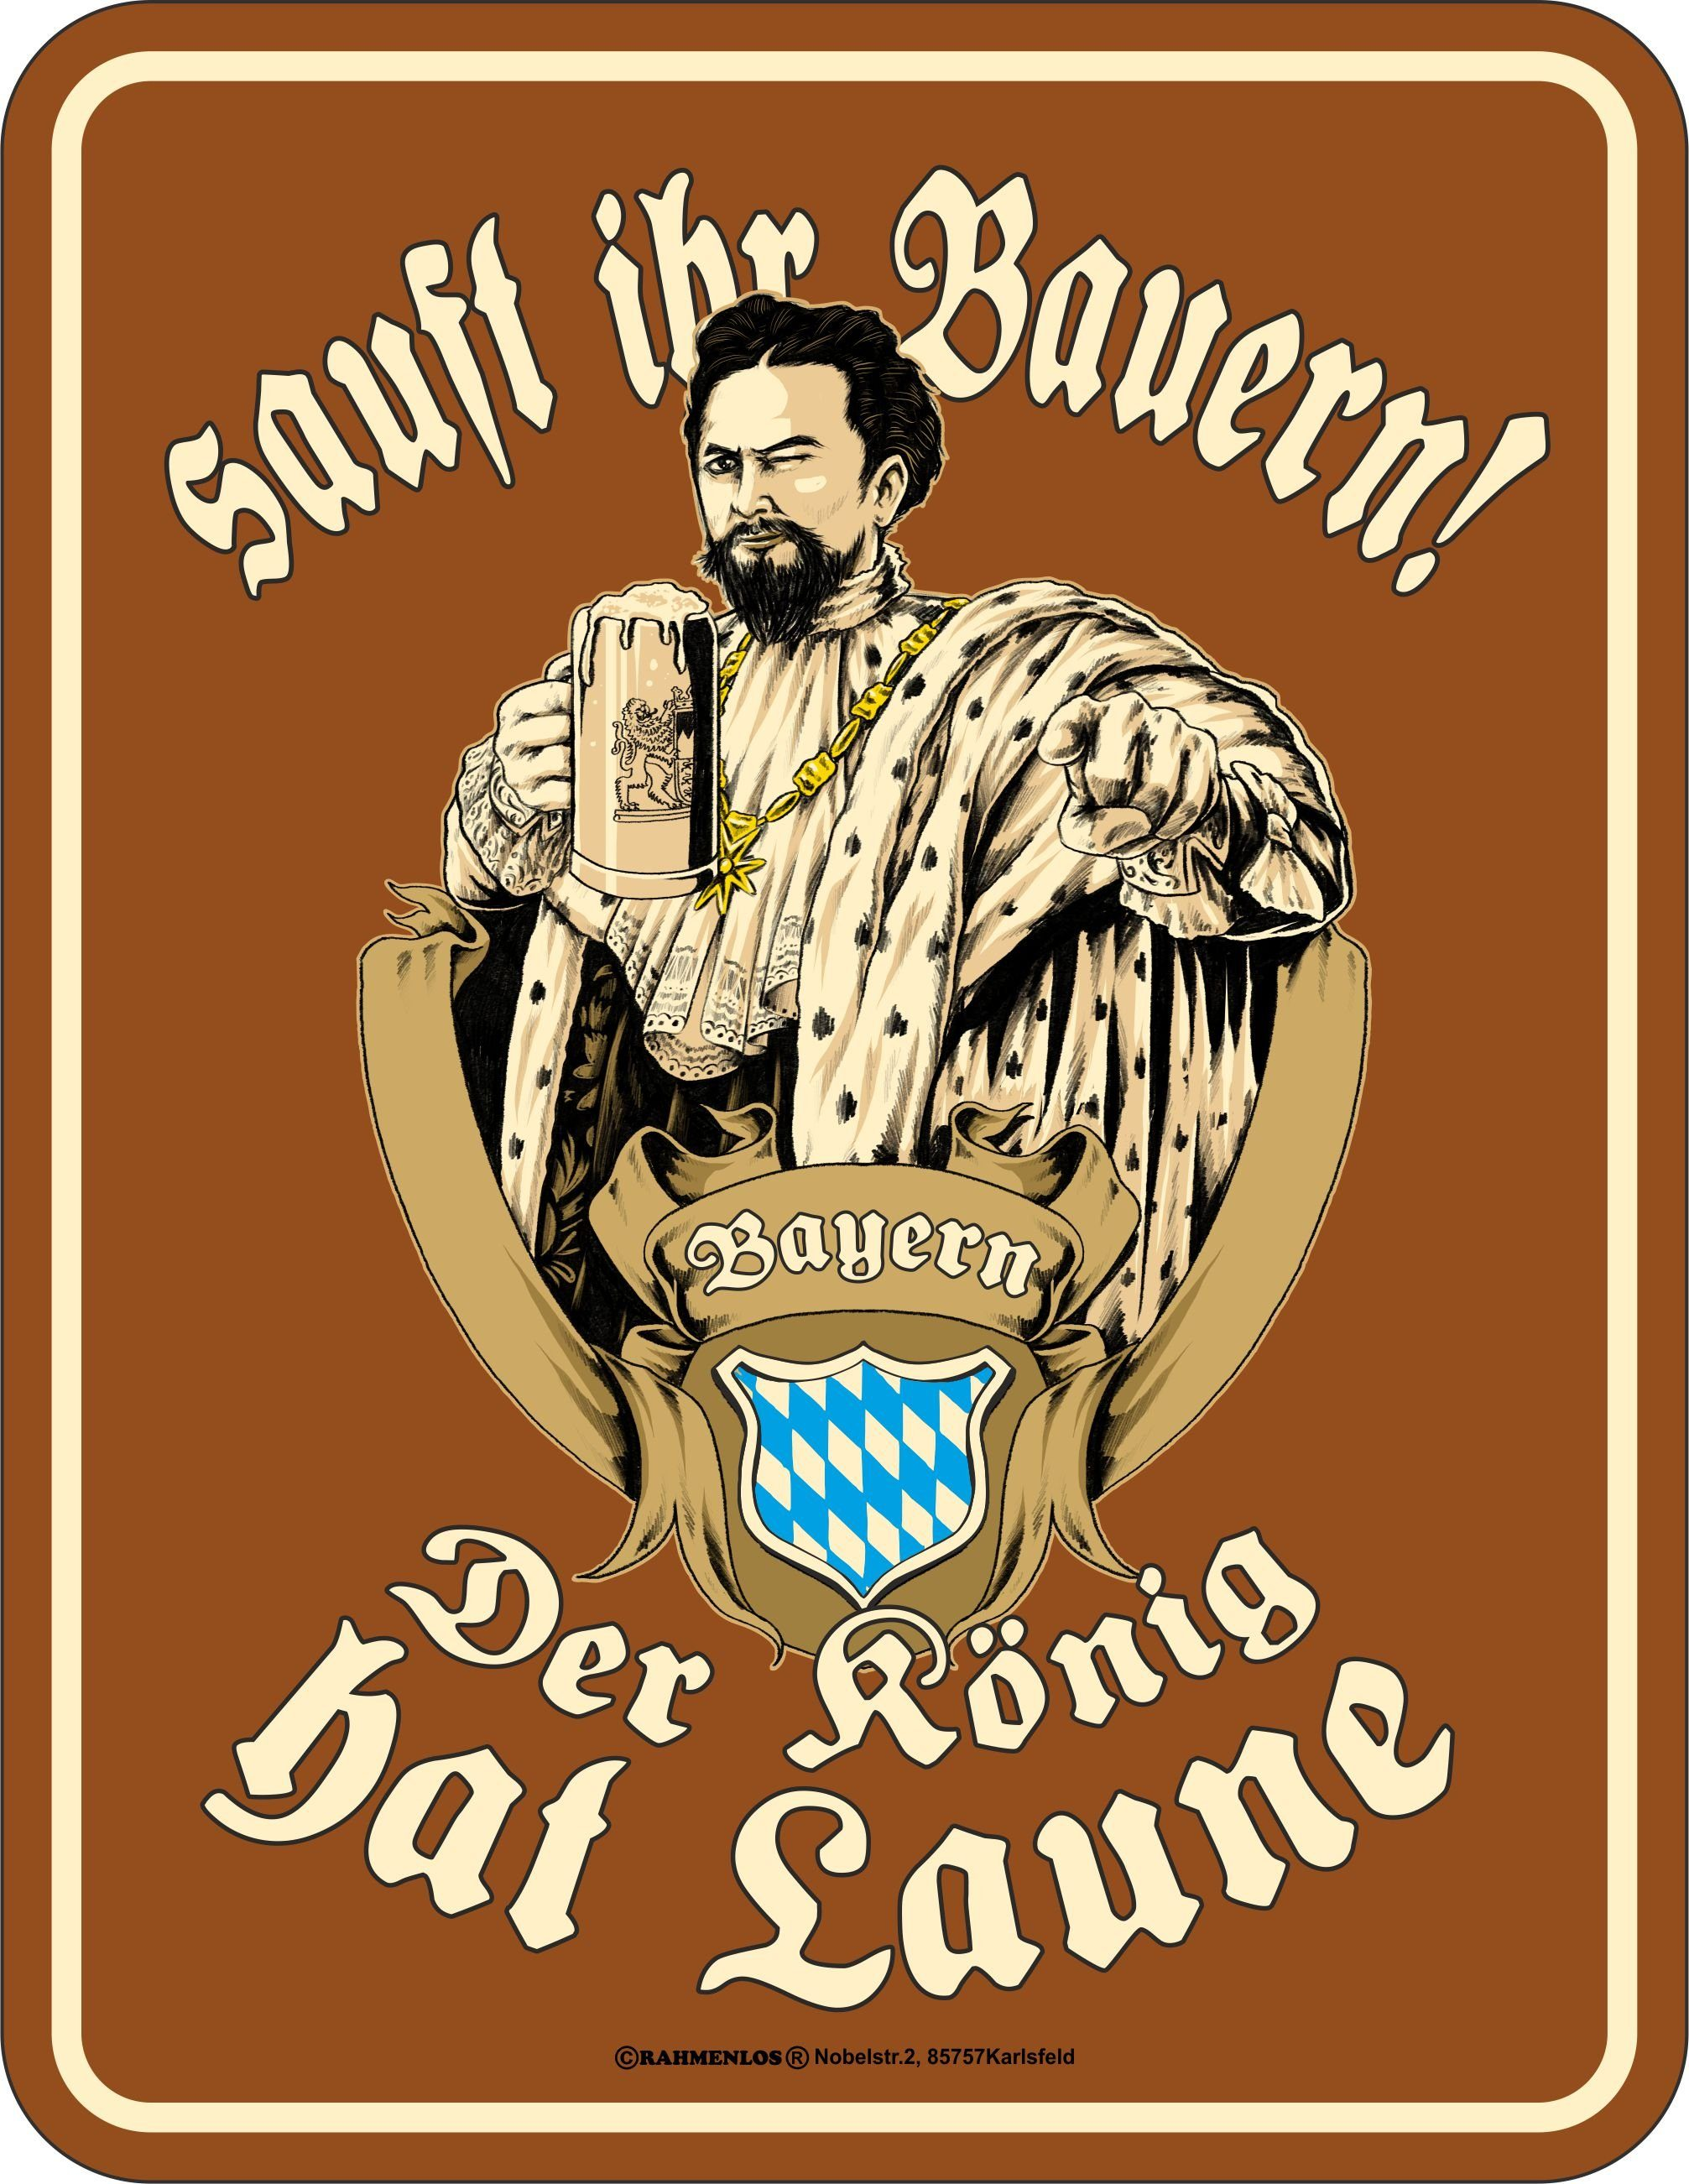 Rahmenlos Blechschild für den königstreuen Bayern-Fan